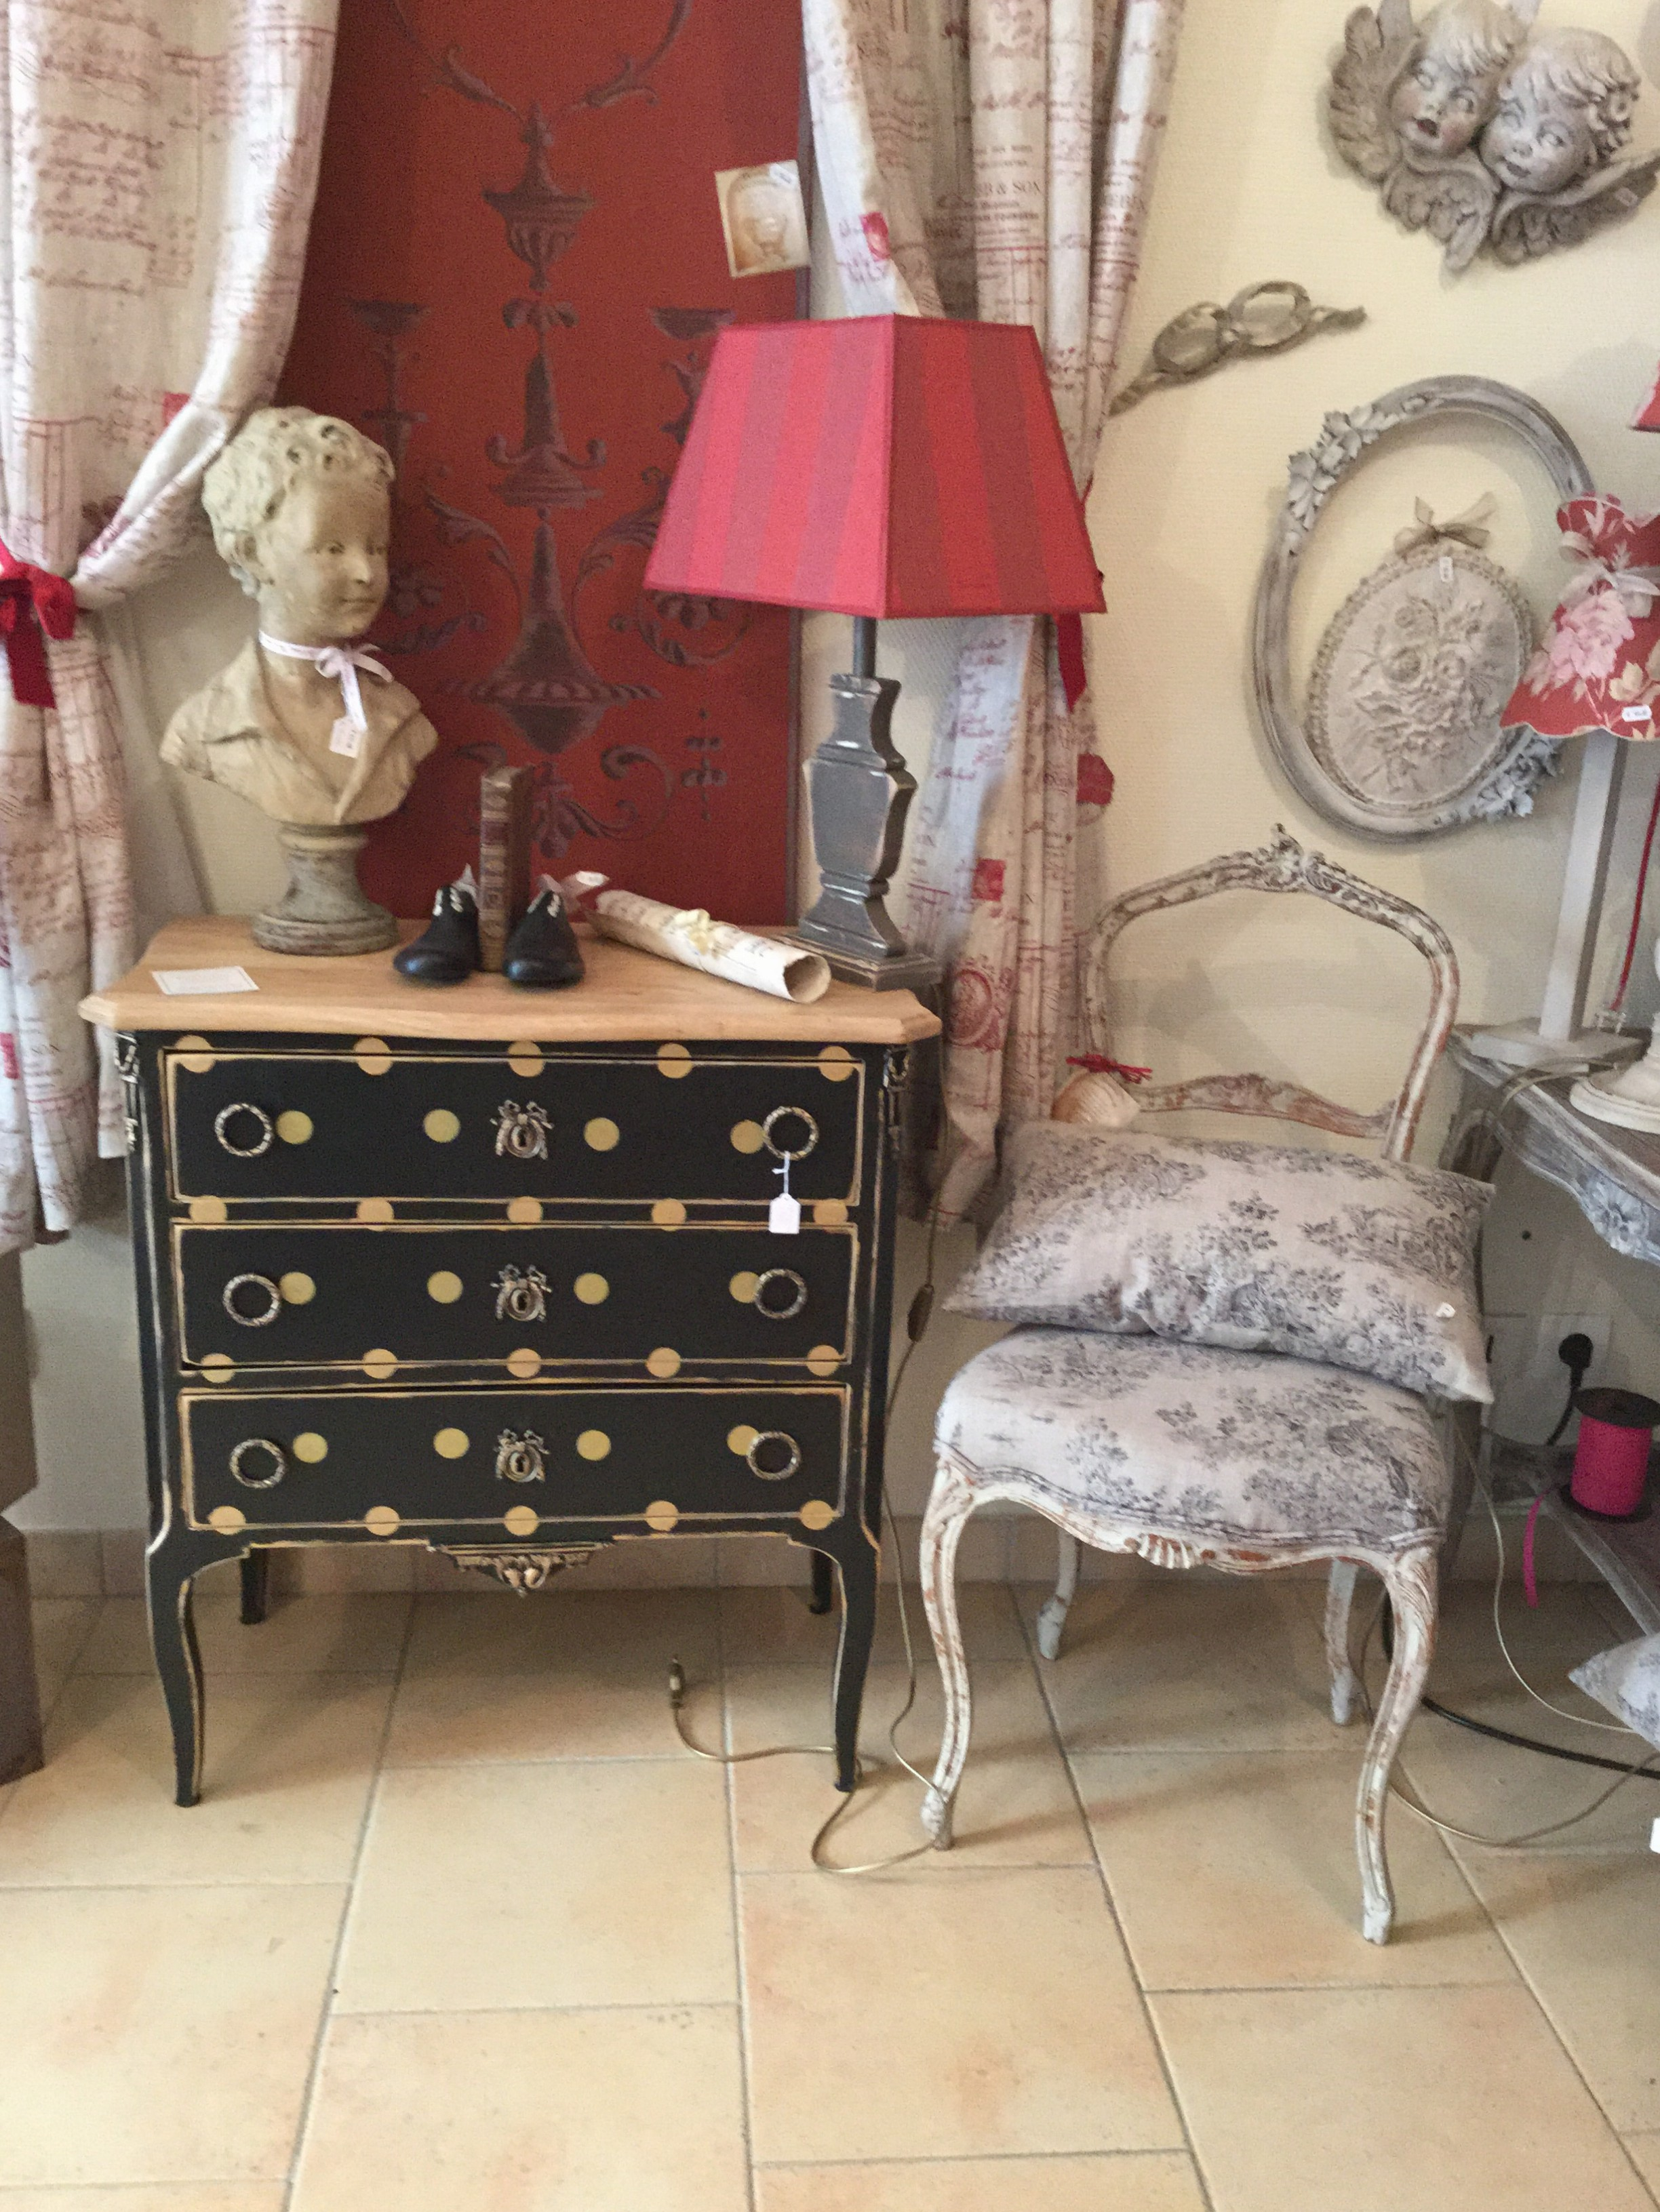 Relooker ses meubles anciens photos de conception de for Relooker meubles anciens